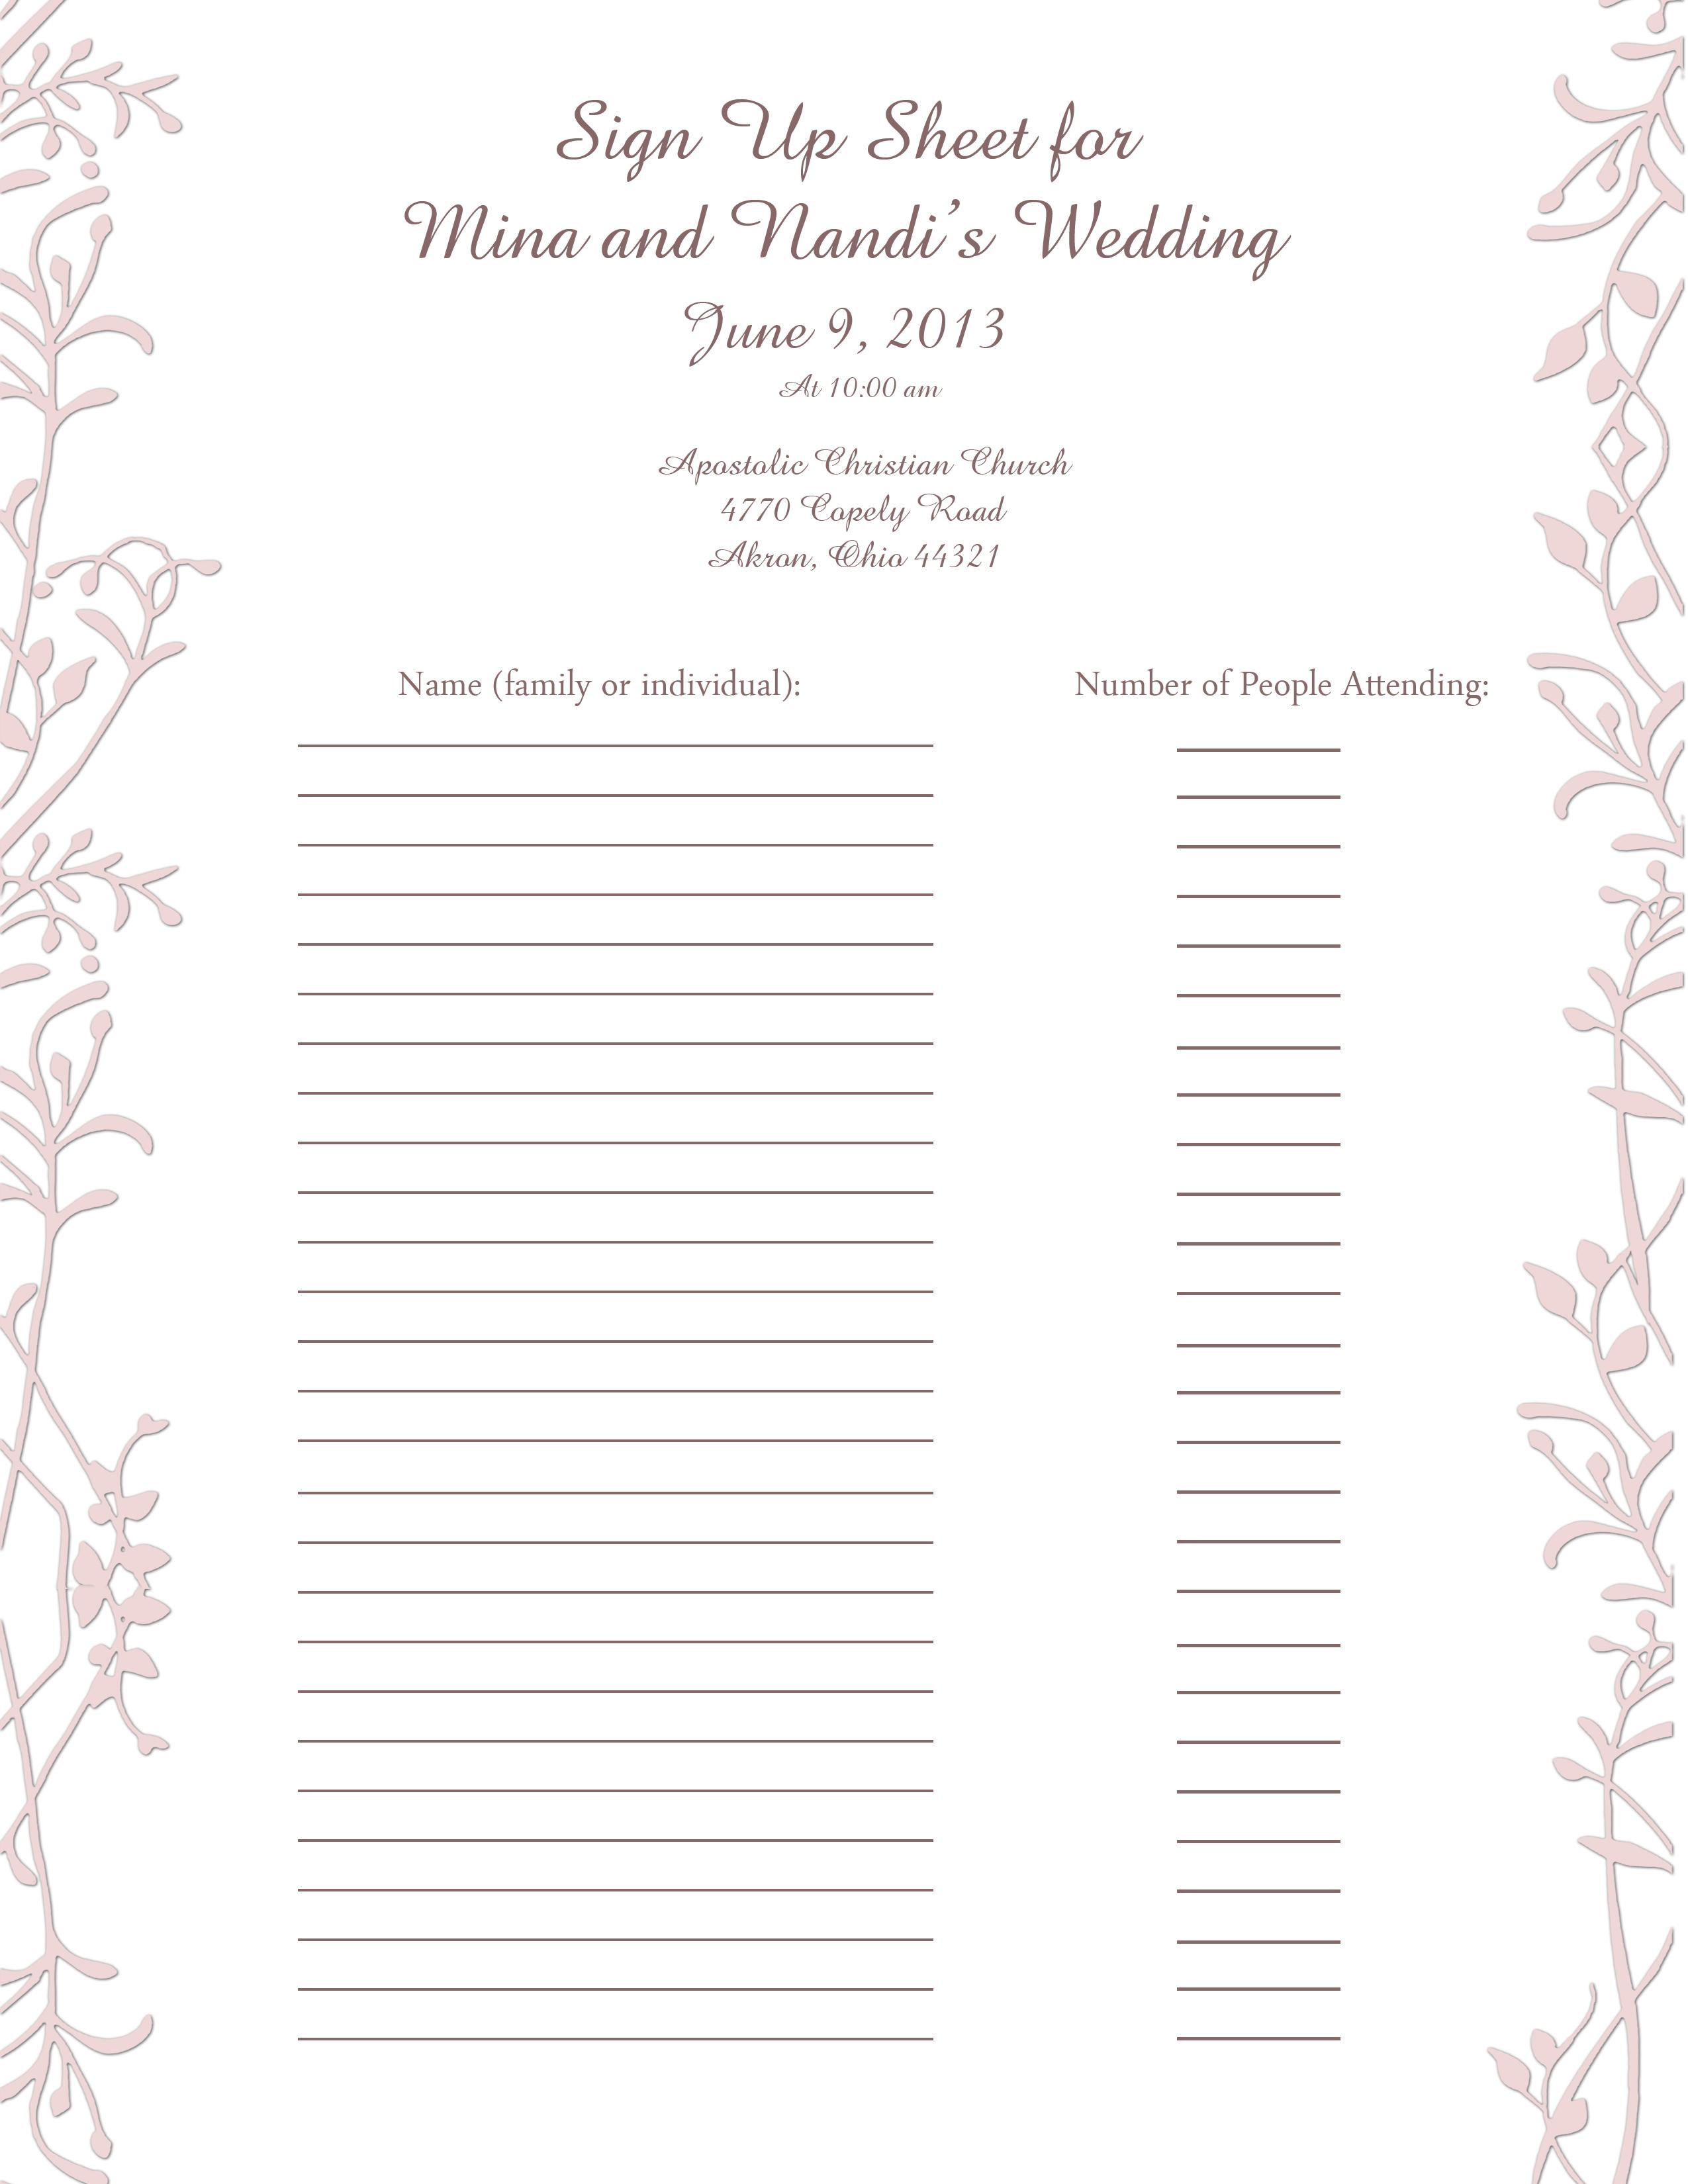 Wedding Sign Up Sheet